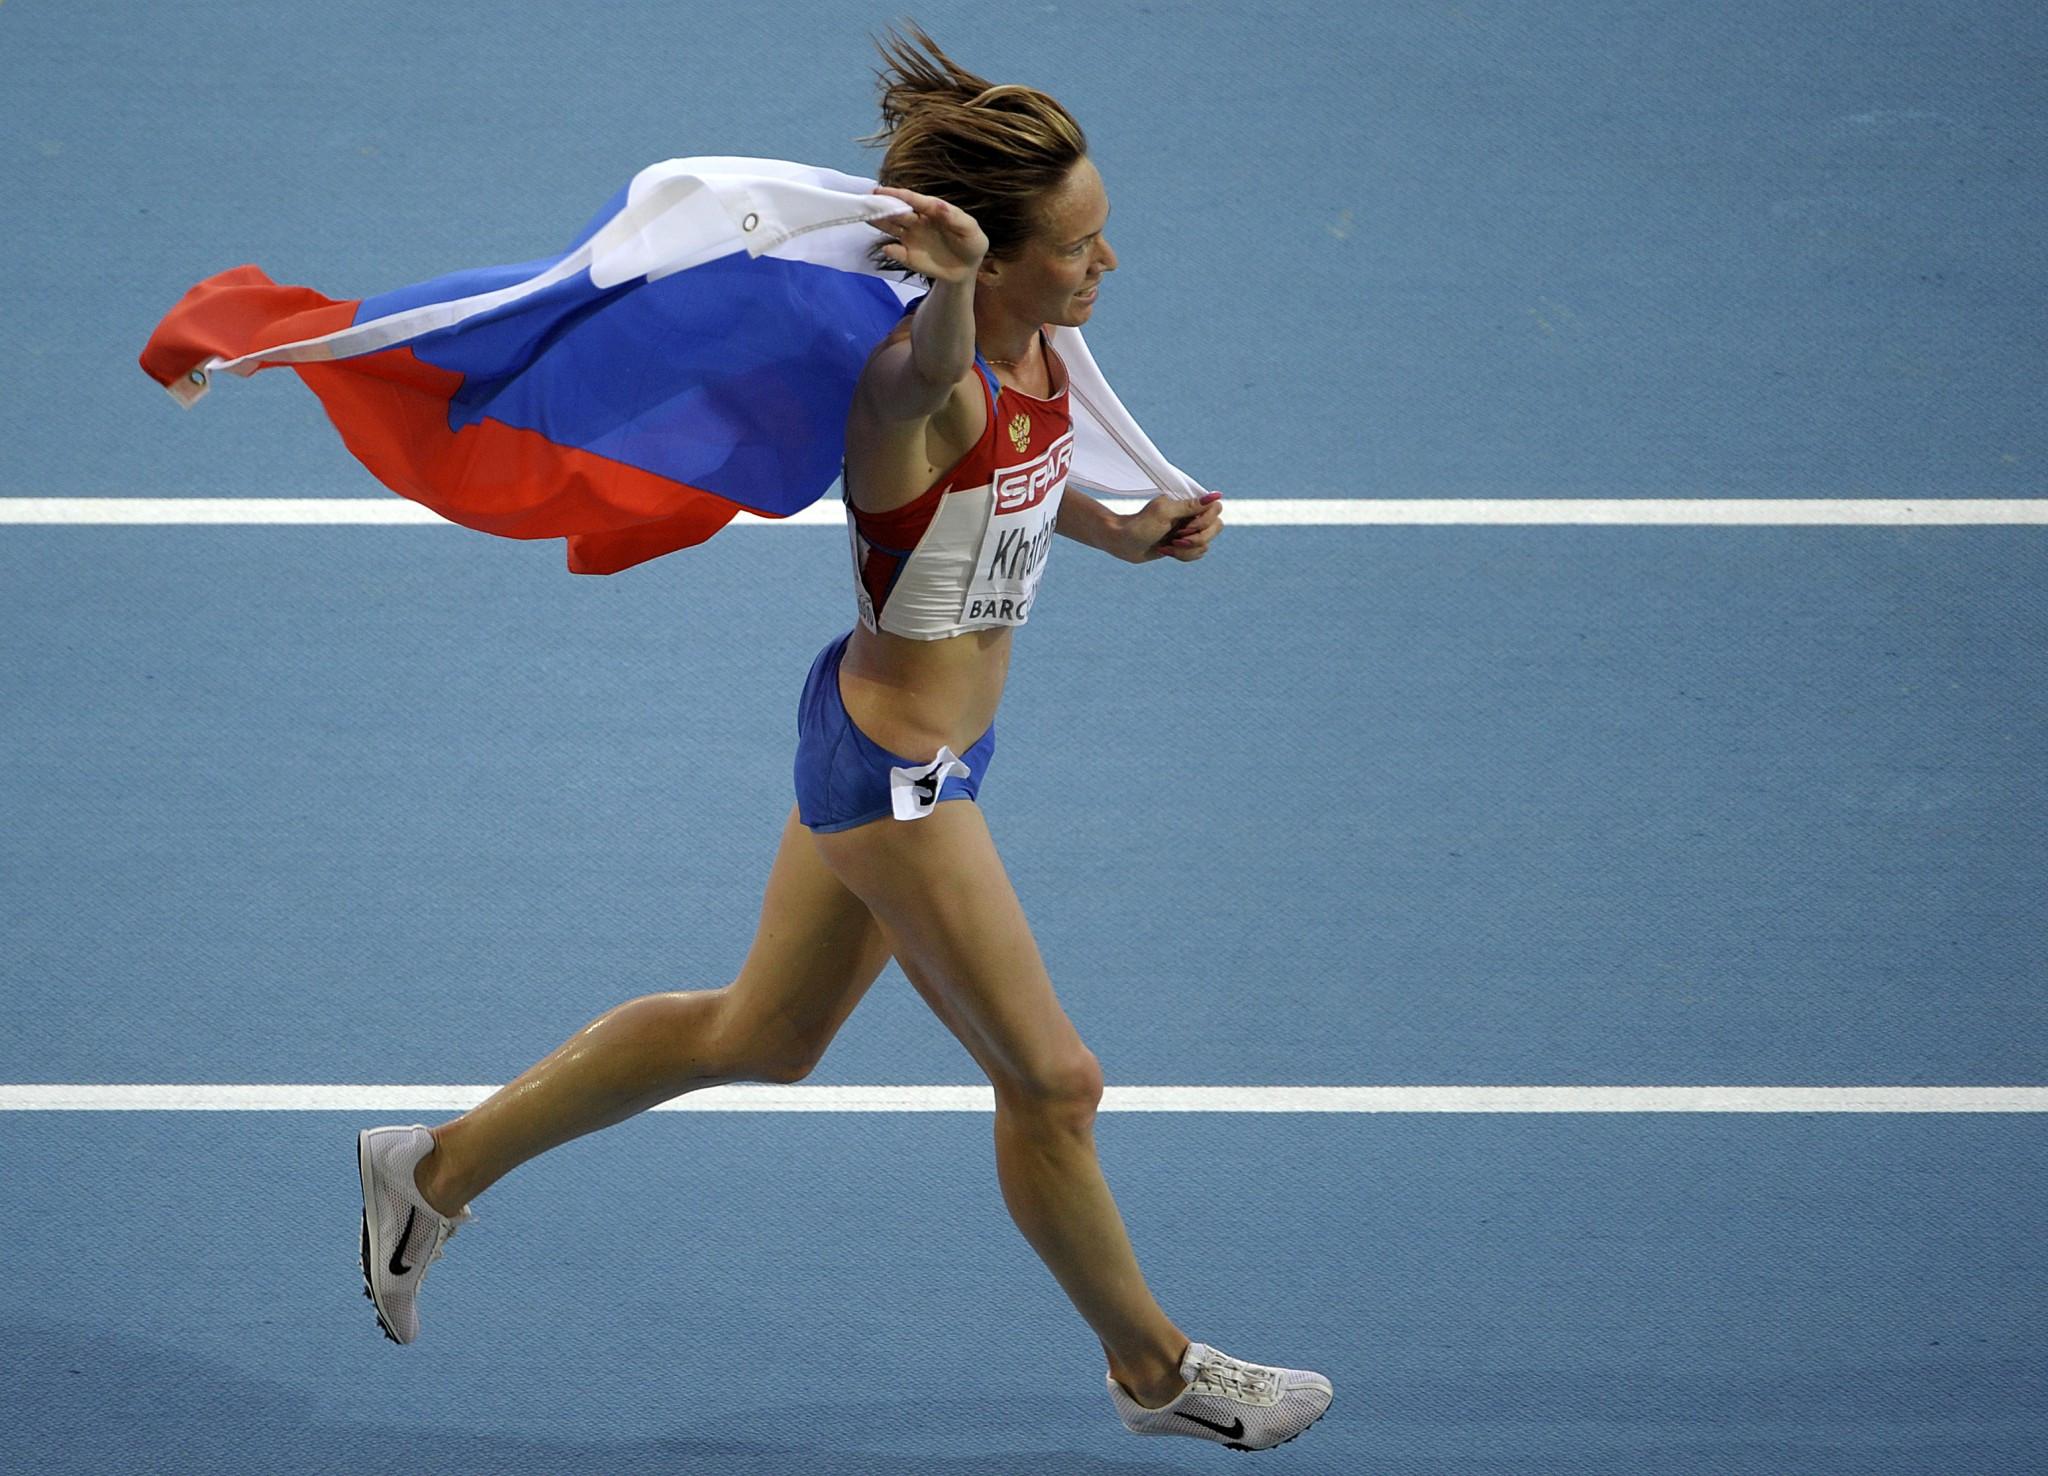 Lyubov Kharlamova celebrates a 3,000m steeplechase medal at the 2010 European Championships ©Getty Images